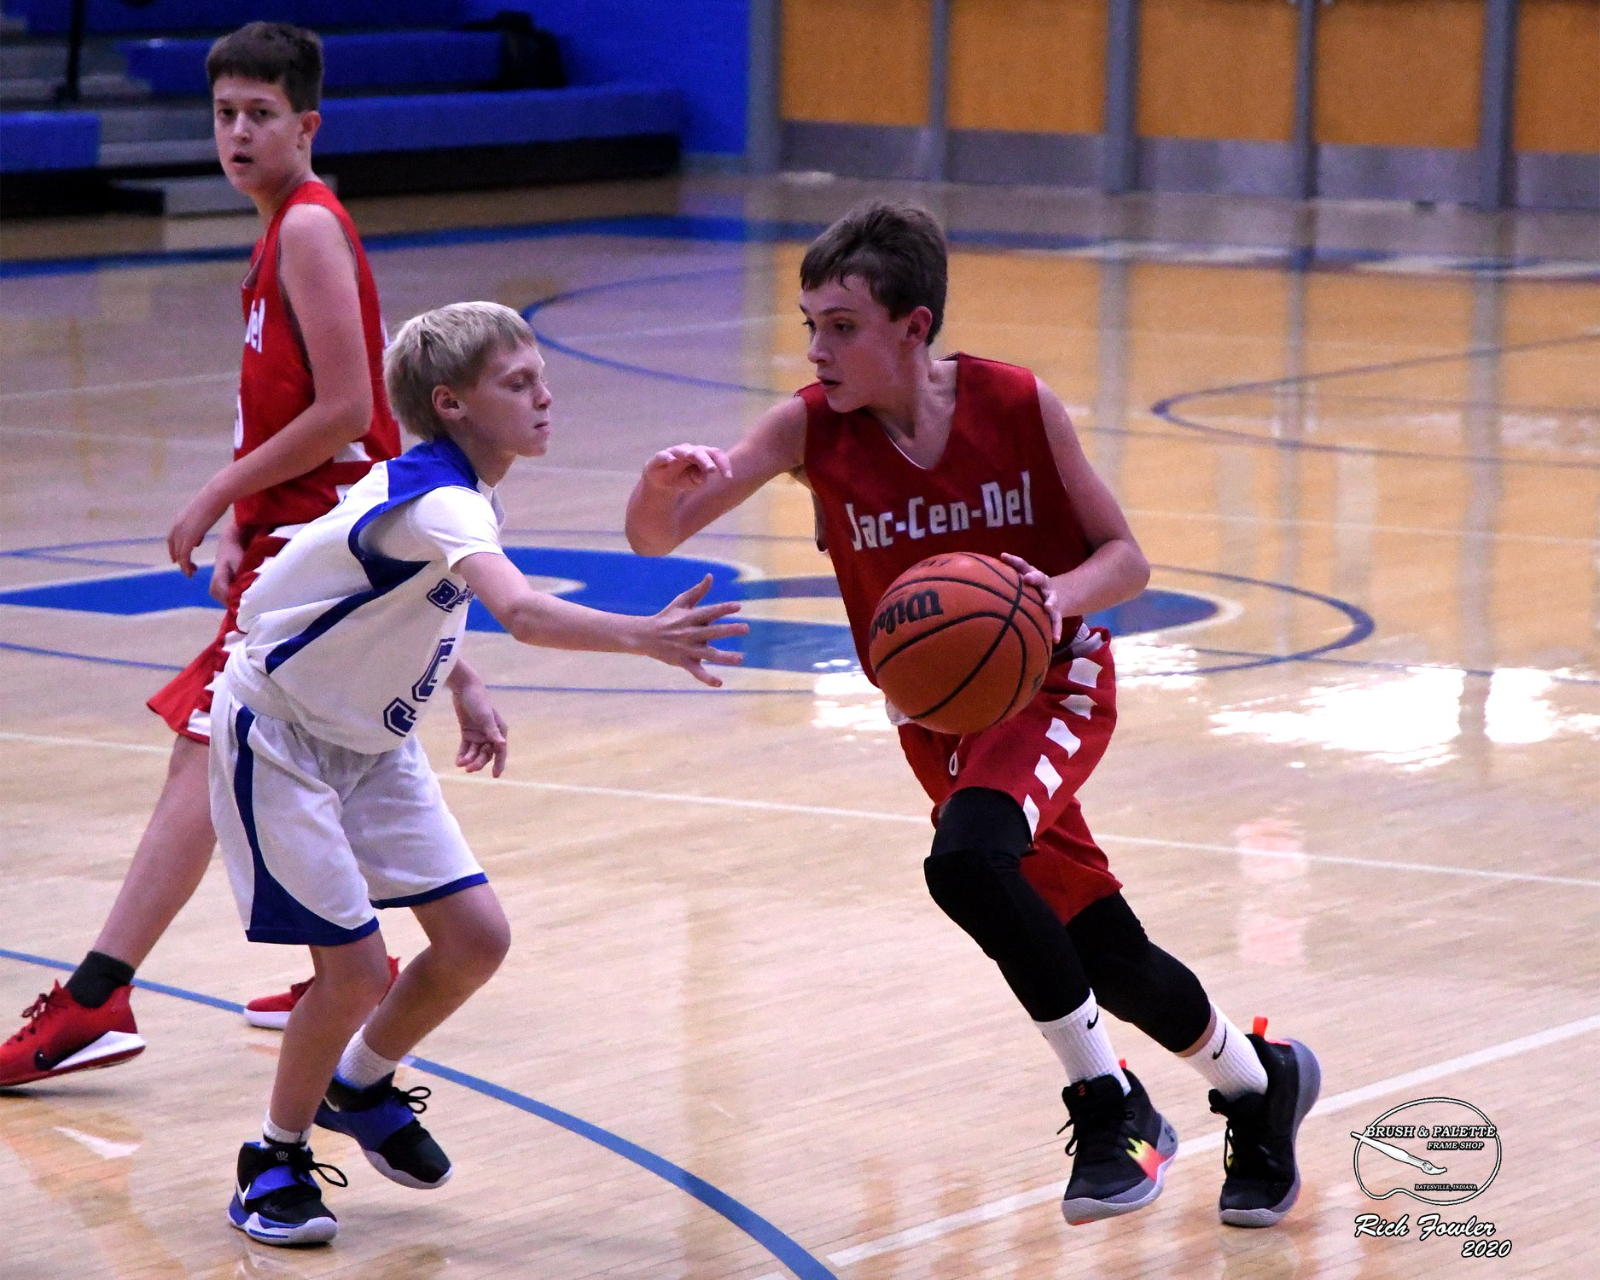 7th grade boys vs Batesville